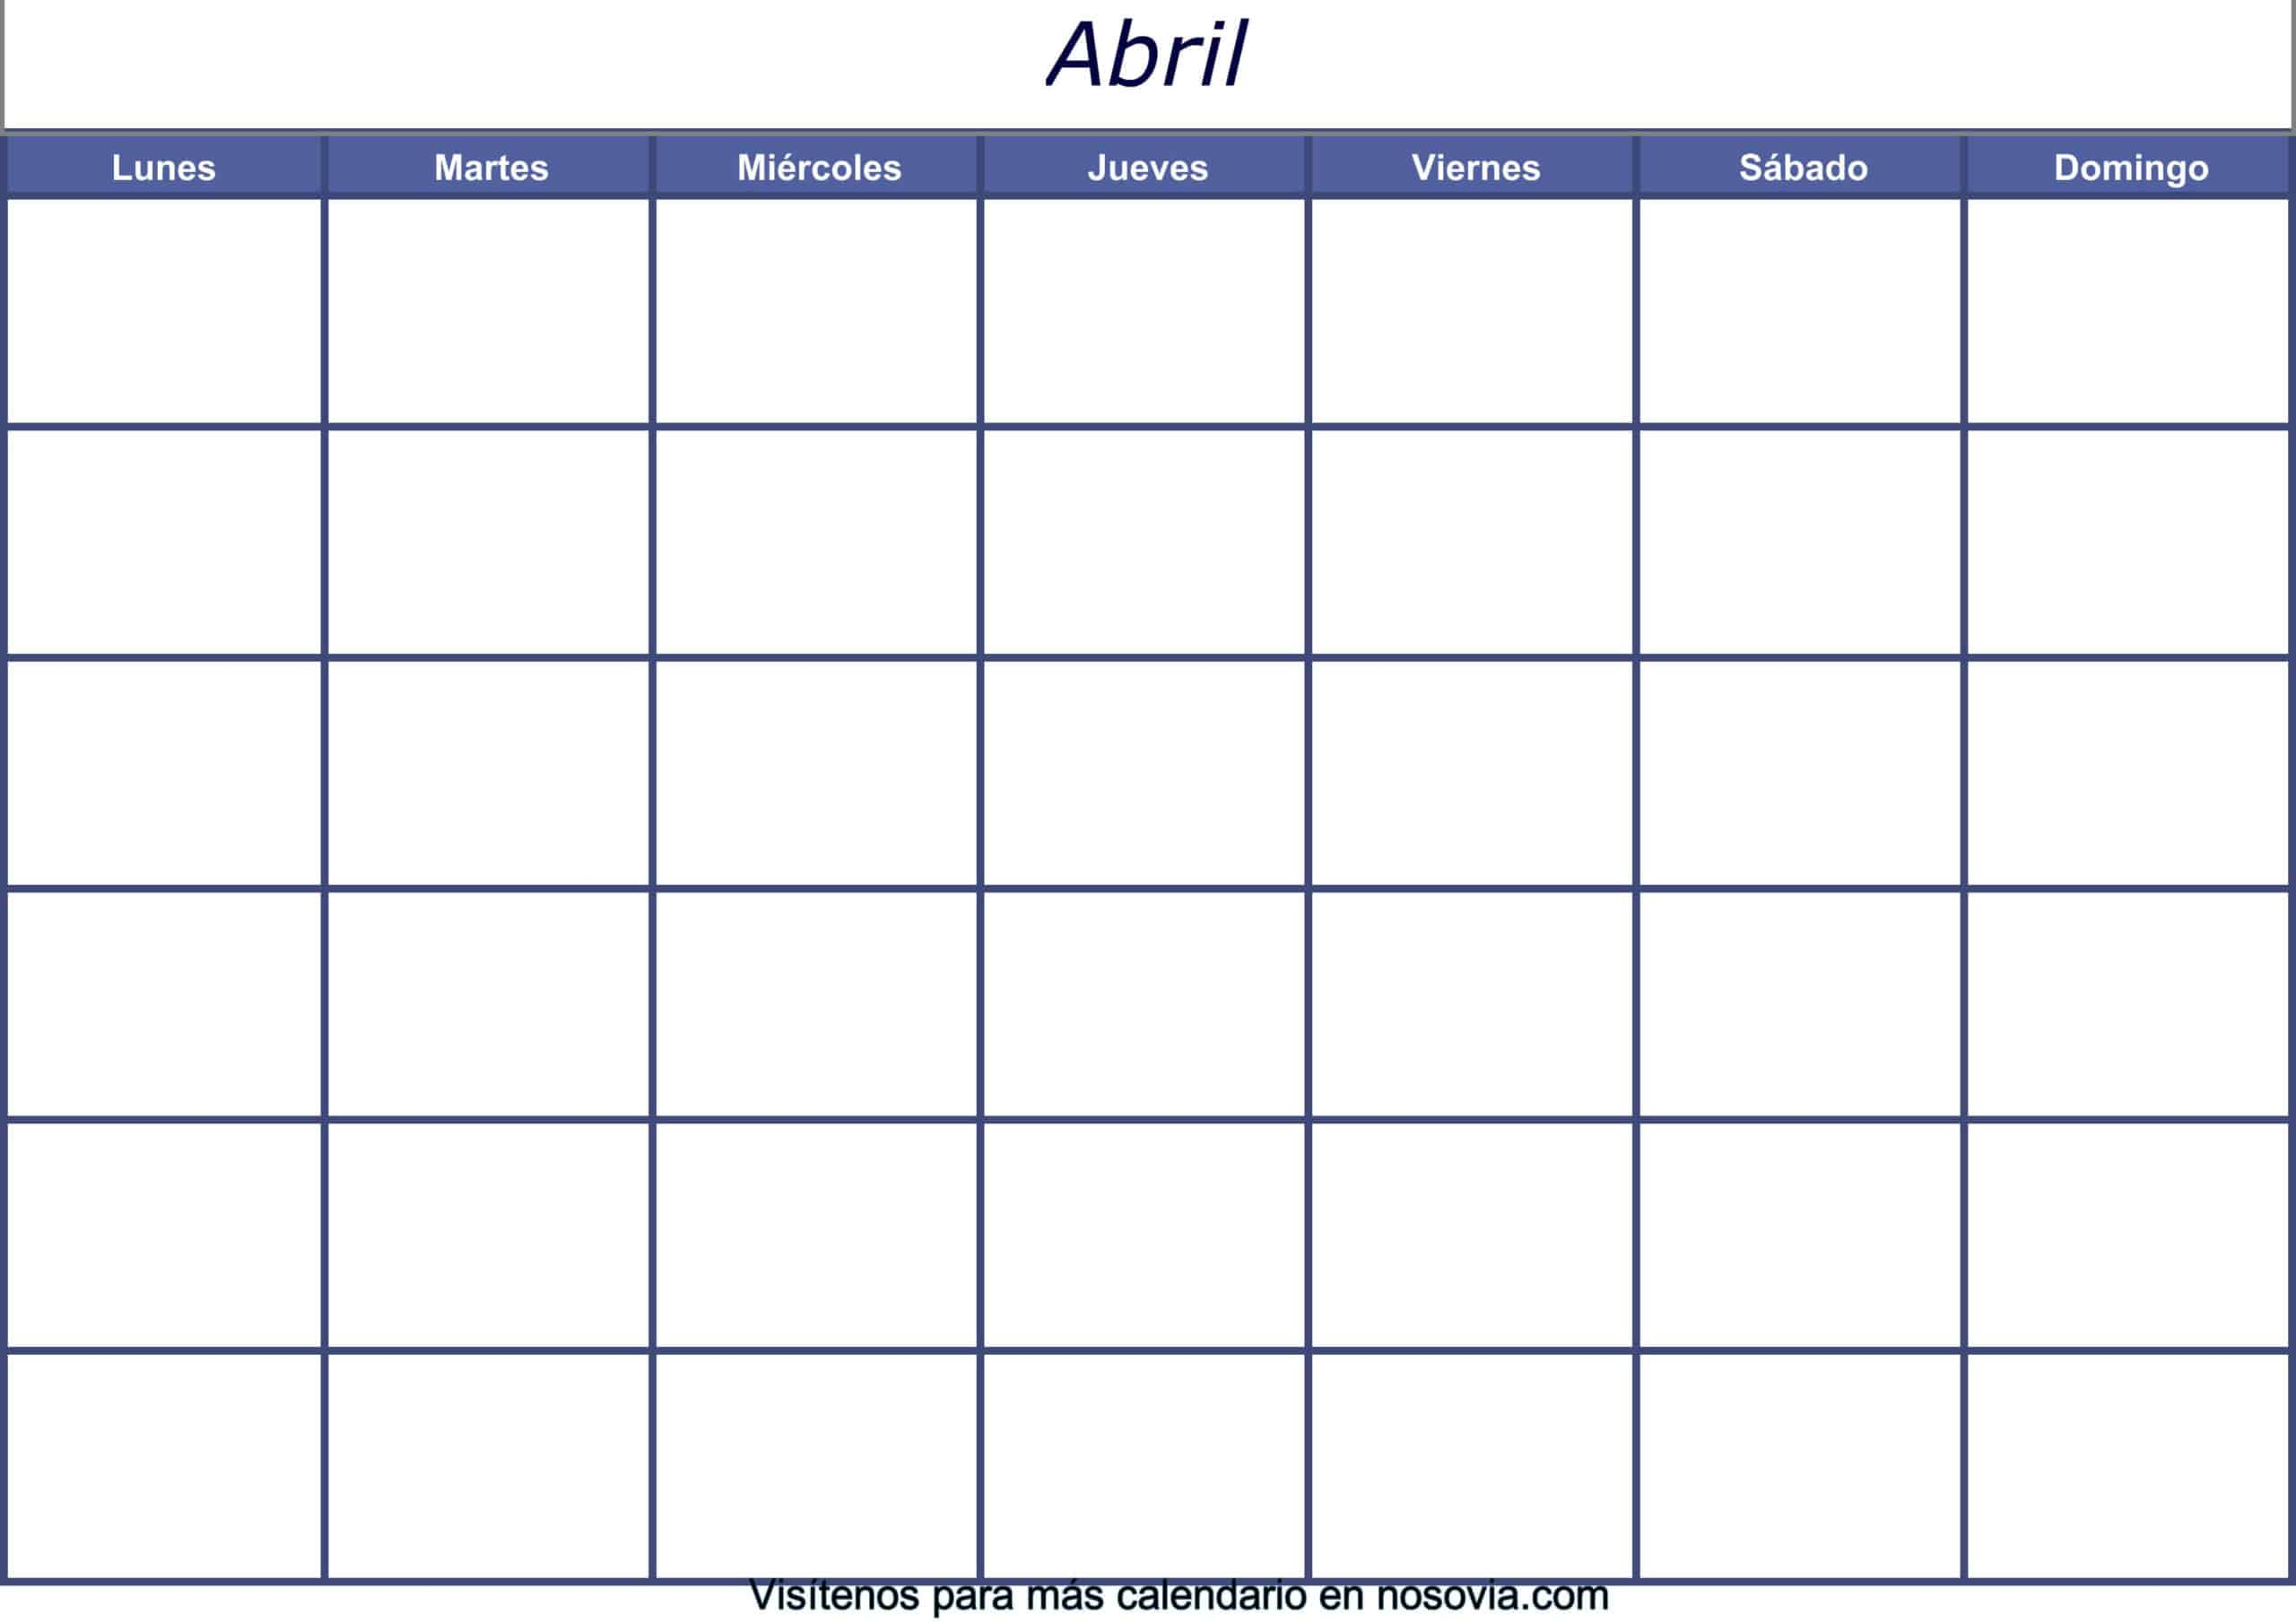 Calendario-abril-2020-en-blanco-para-imprimir-gratis